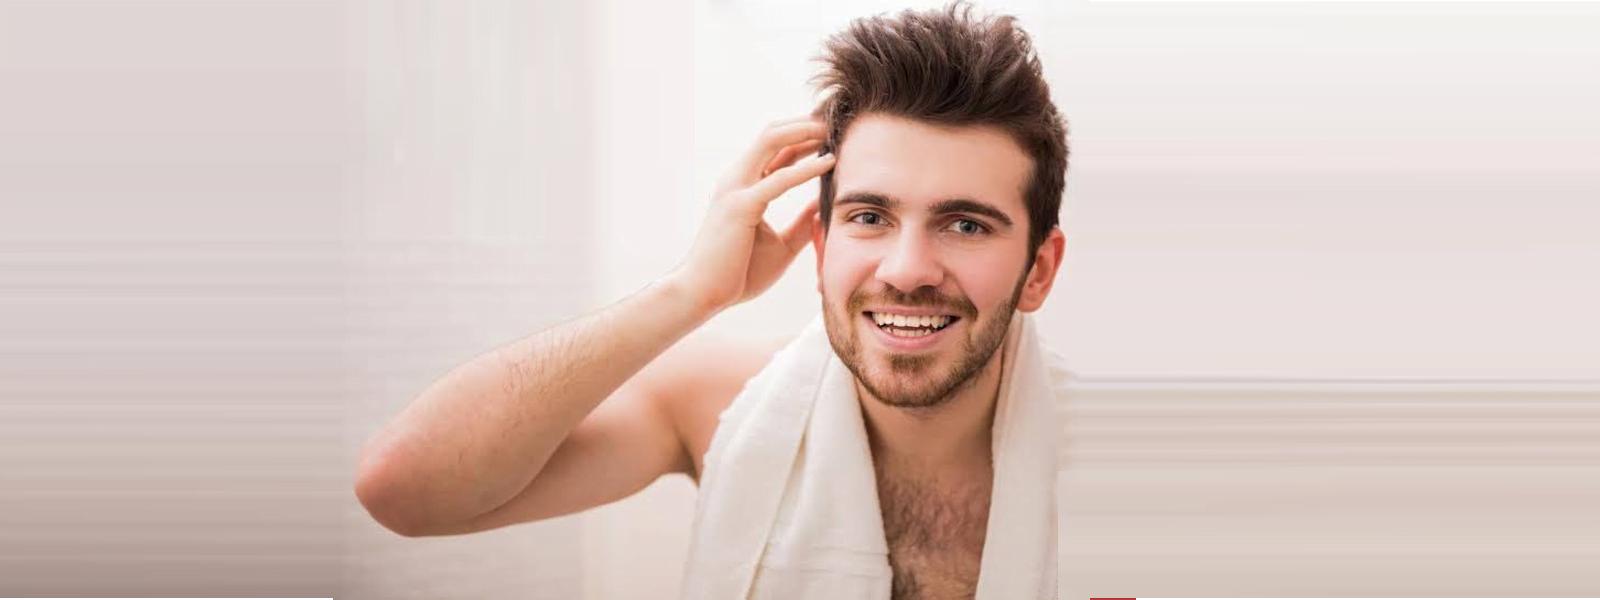 Hair Transplant Case